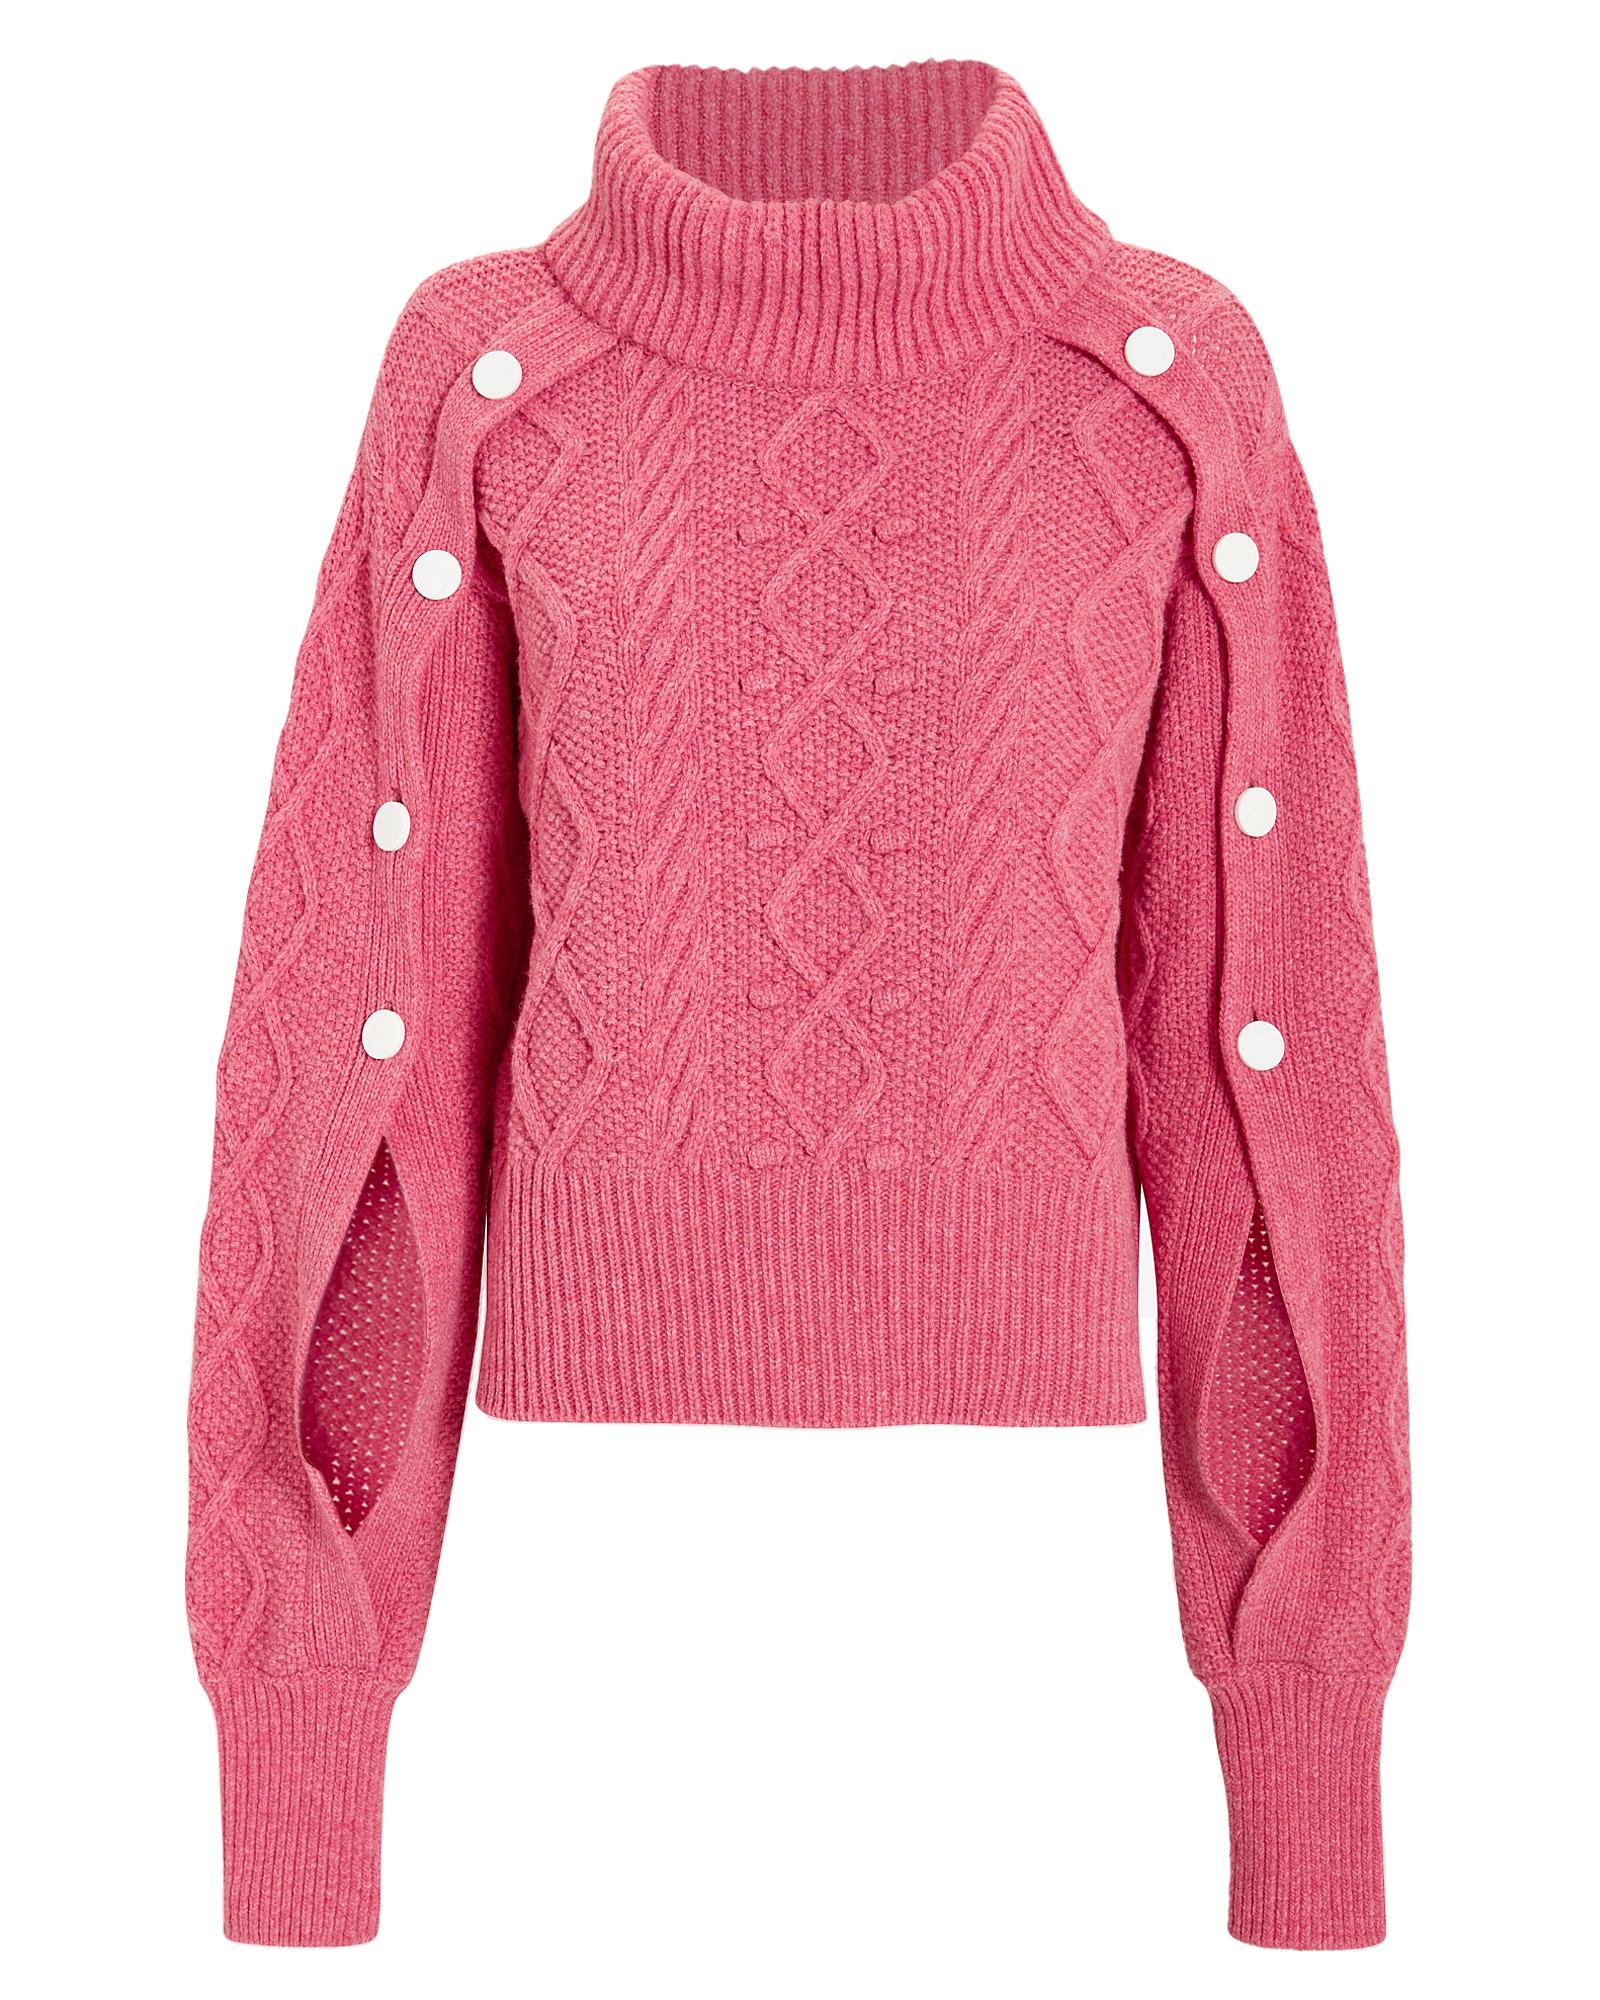 HELLESSY Digby Turtleneck Sweater